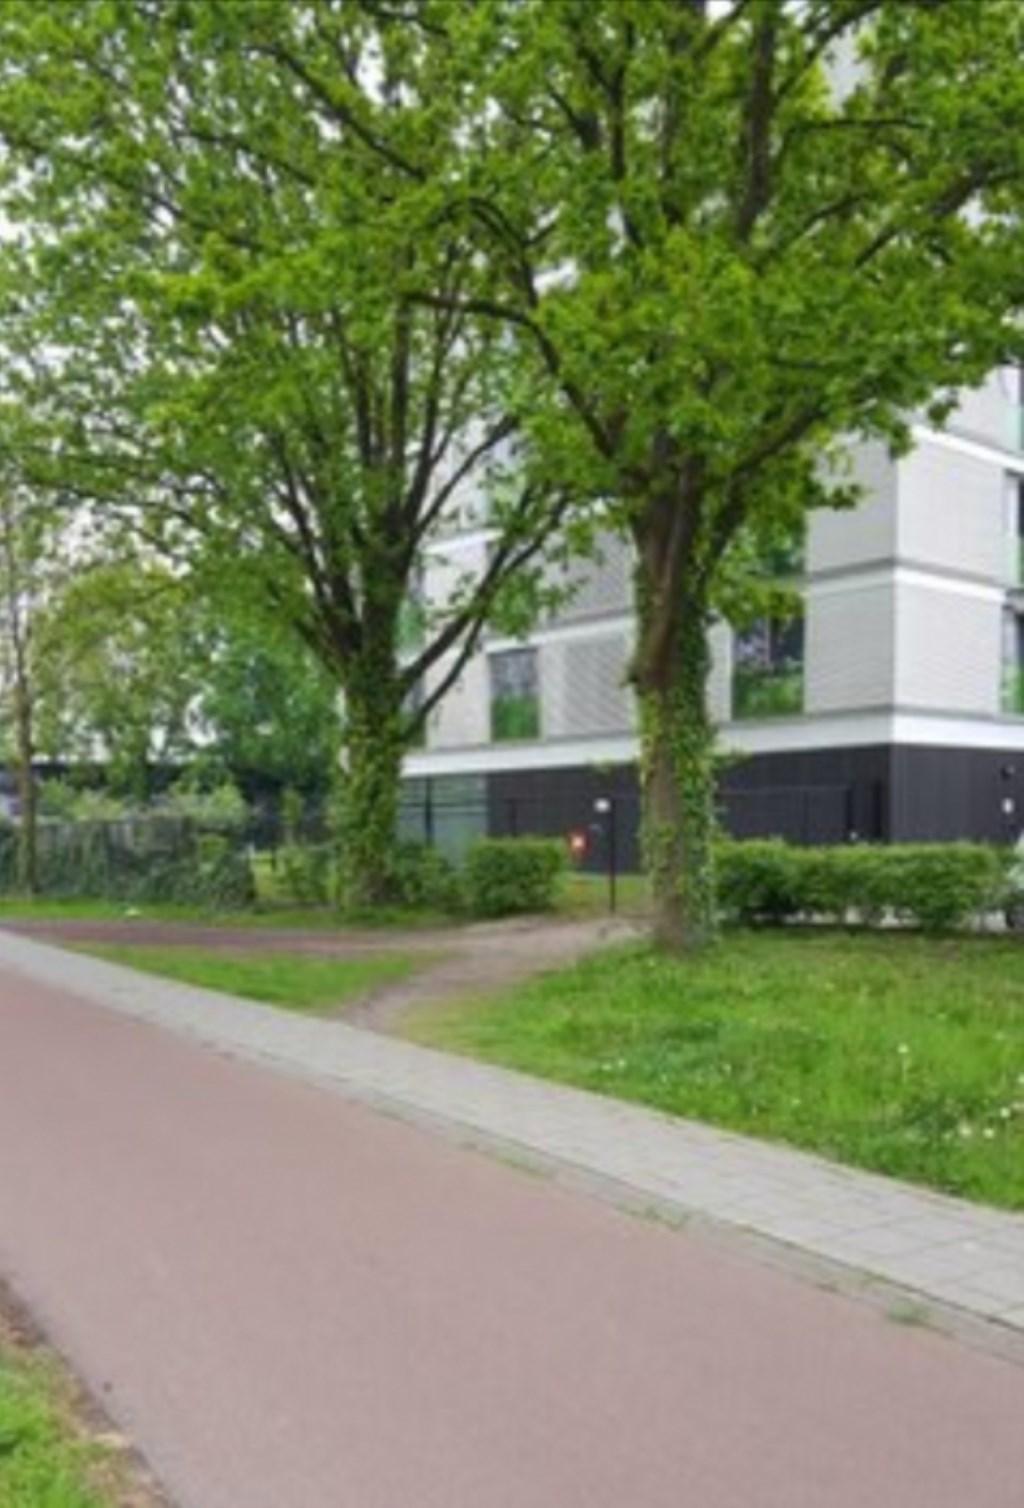 Ettensebaan, Easy Street Campus  © BredaVandaag